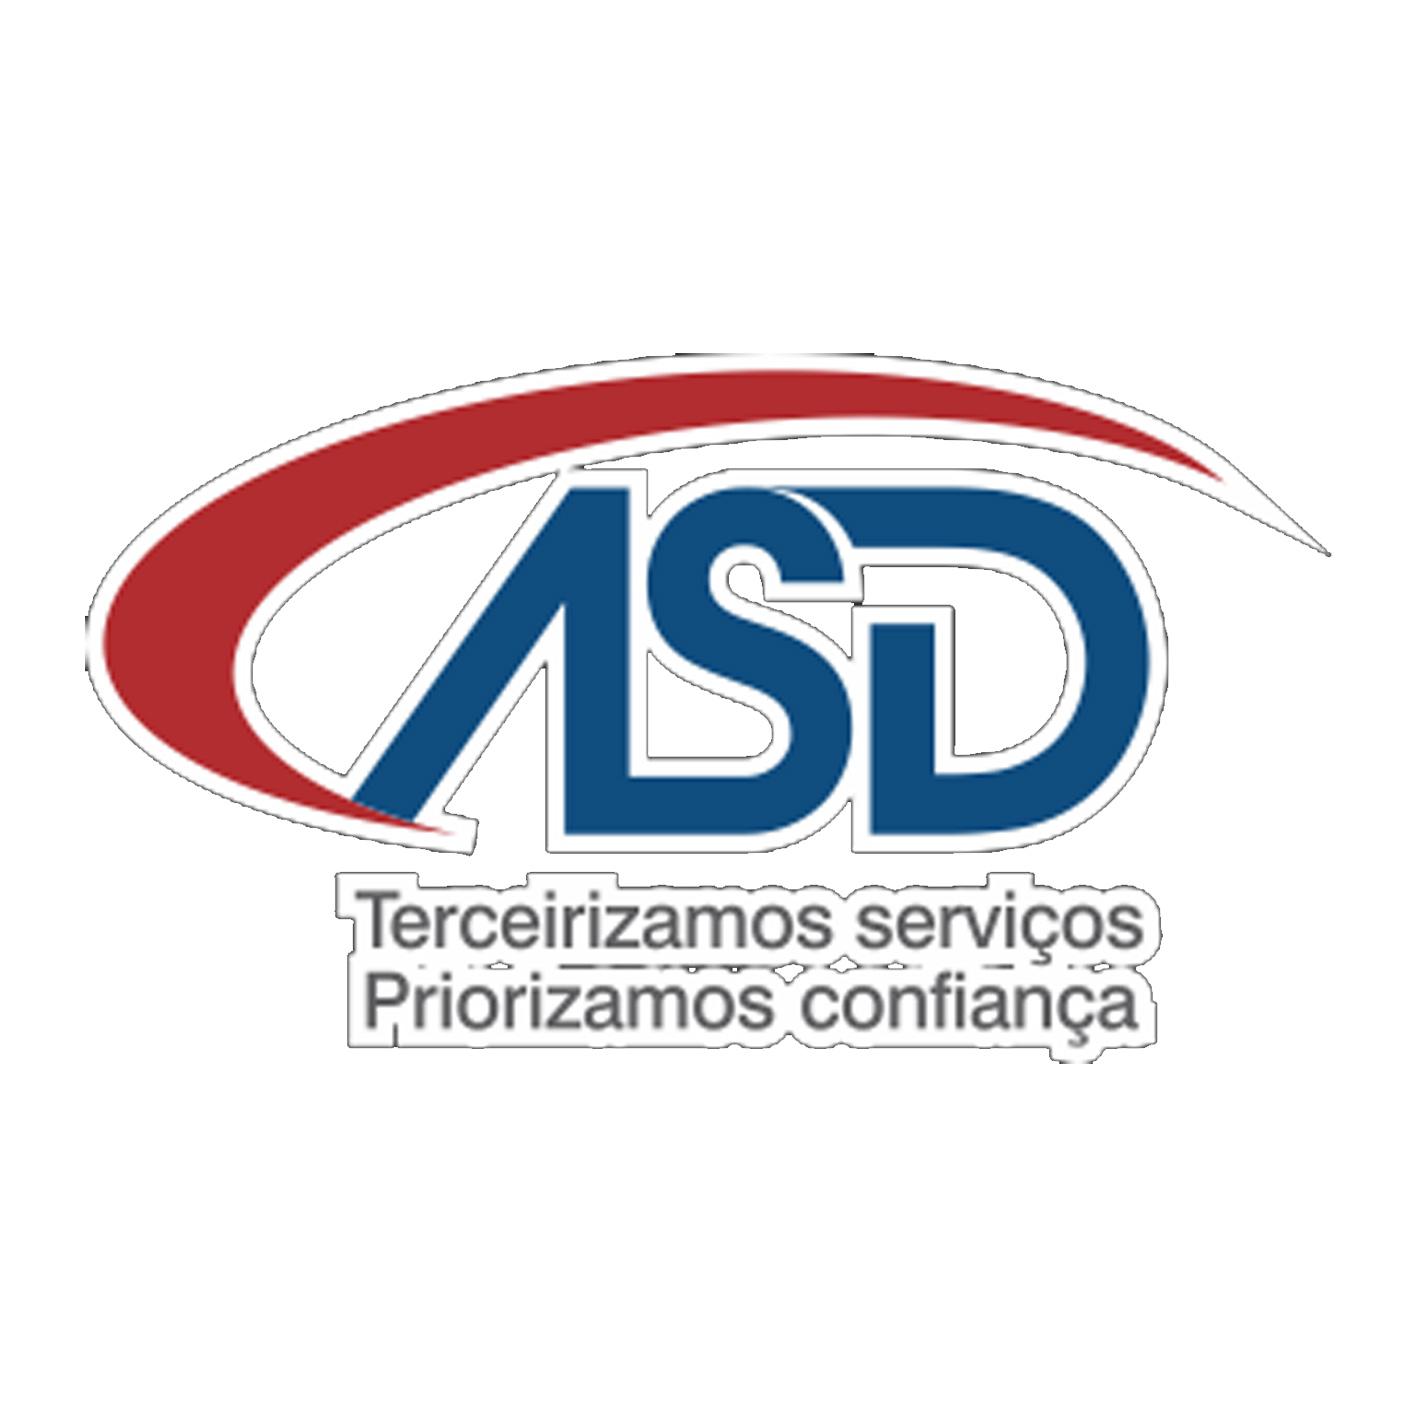 https://s3.amazonaws.com/dinder.com.br/wp-content/uploads/sites/566/2020/01/4.jpg